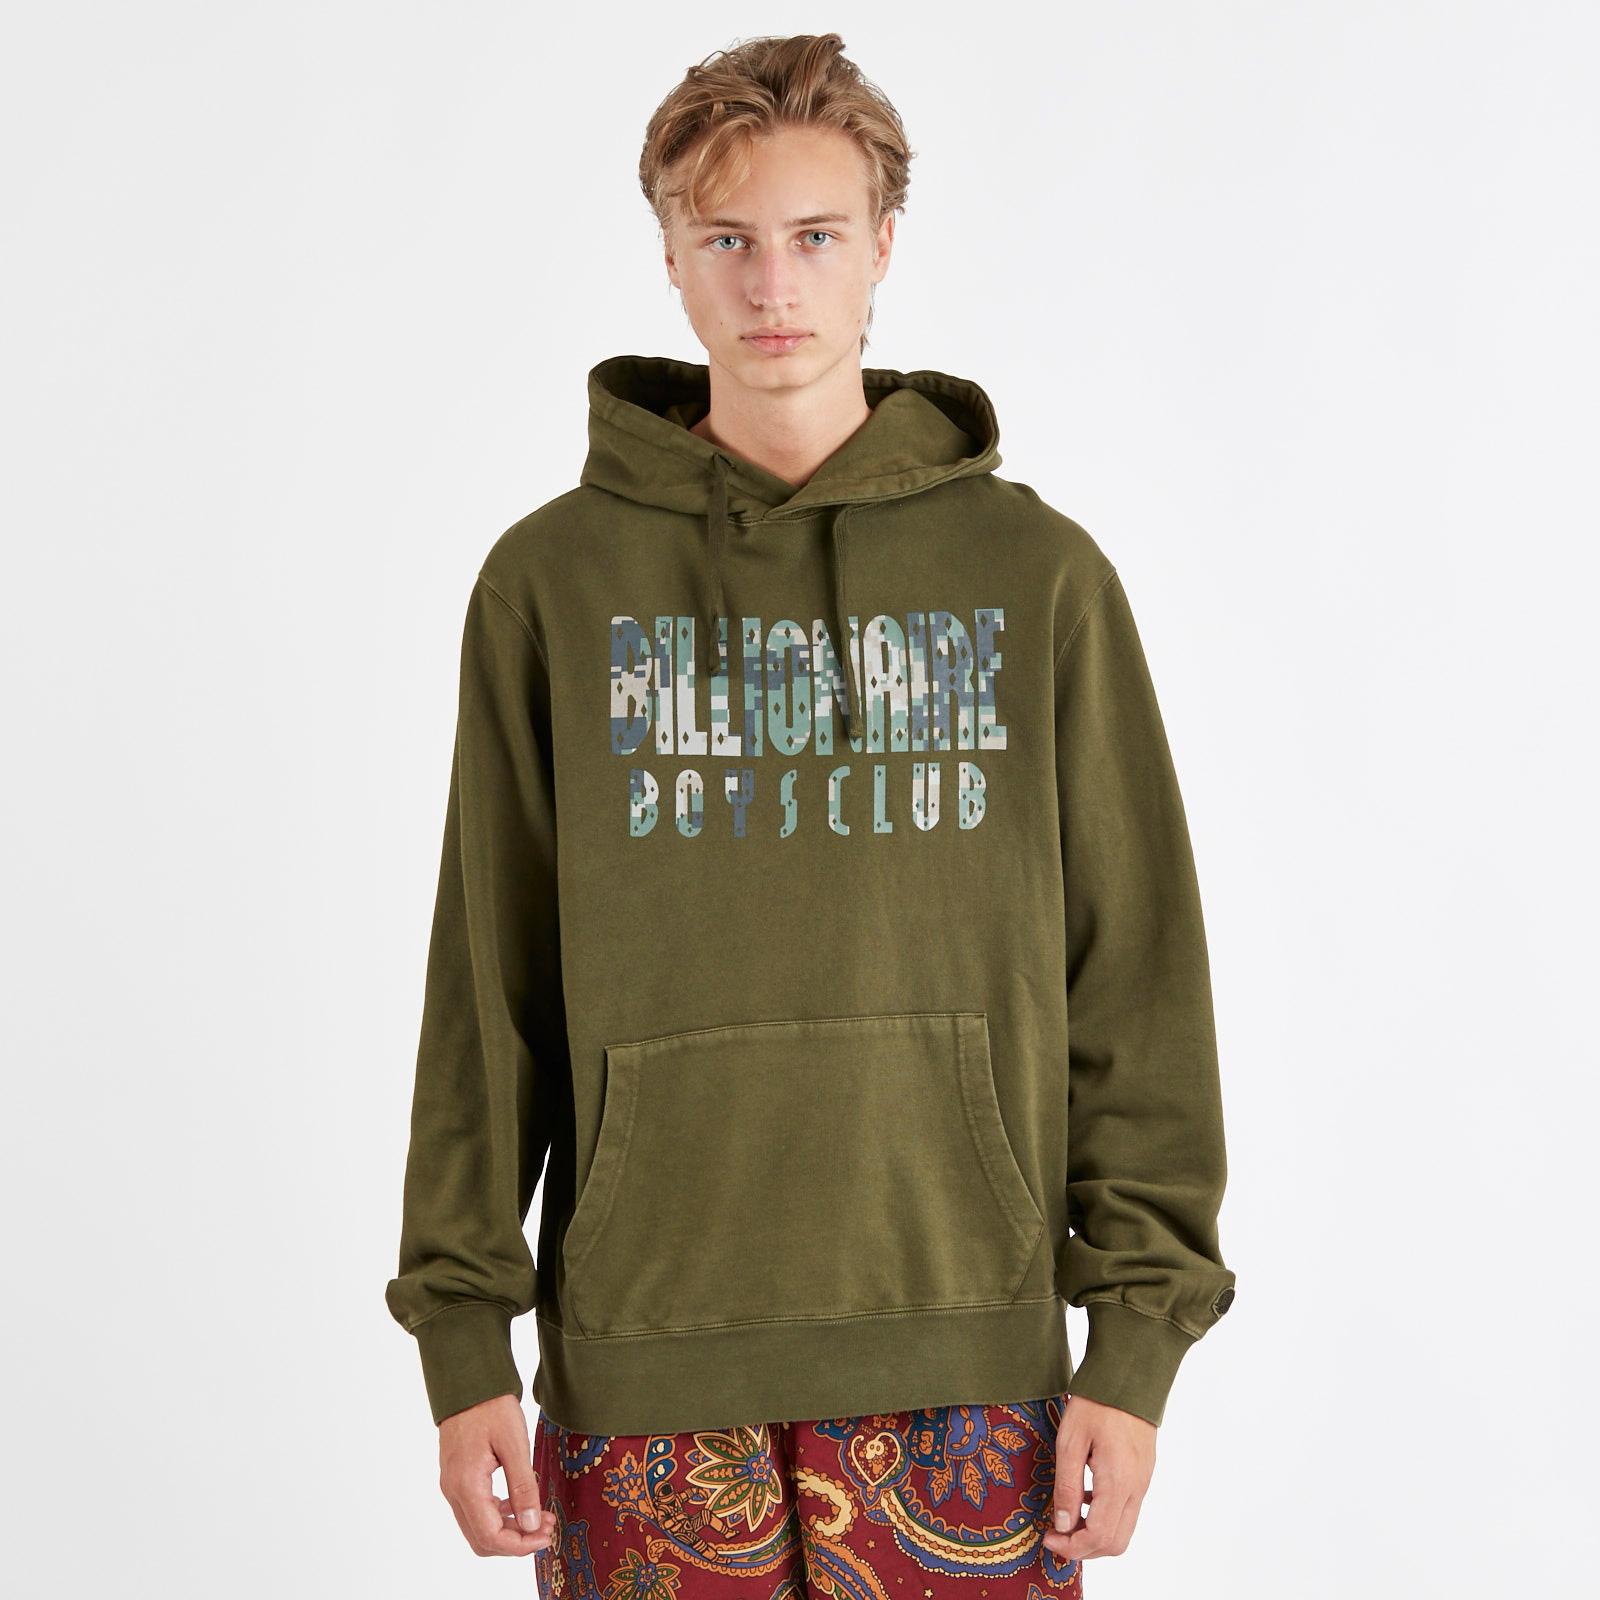 82147239d Billionaire Boys Club Overdye Digi Camo Popover Hood - B18337olive ...